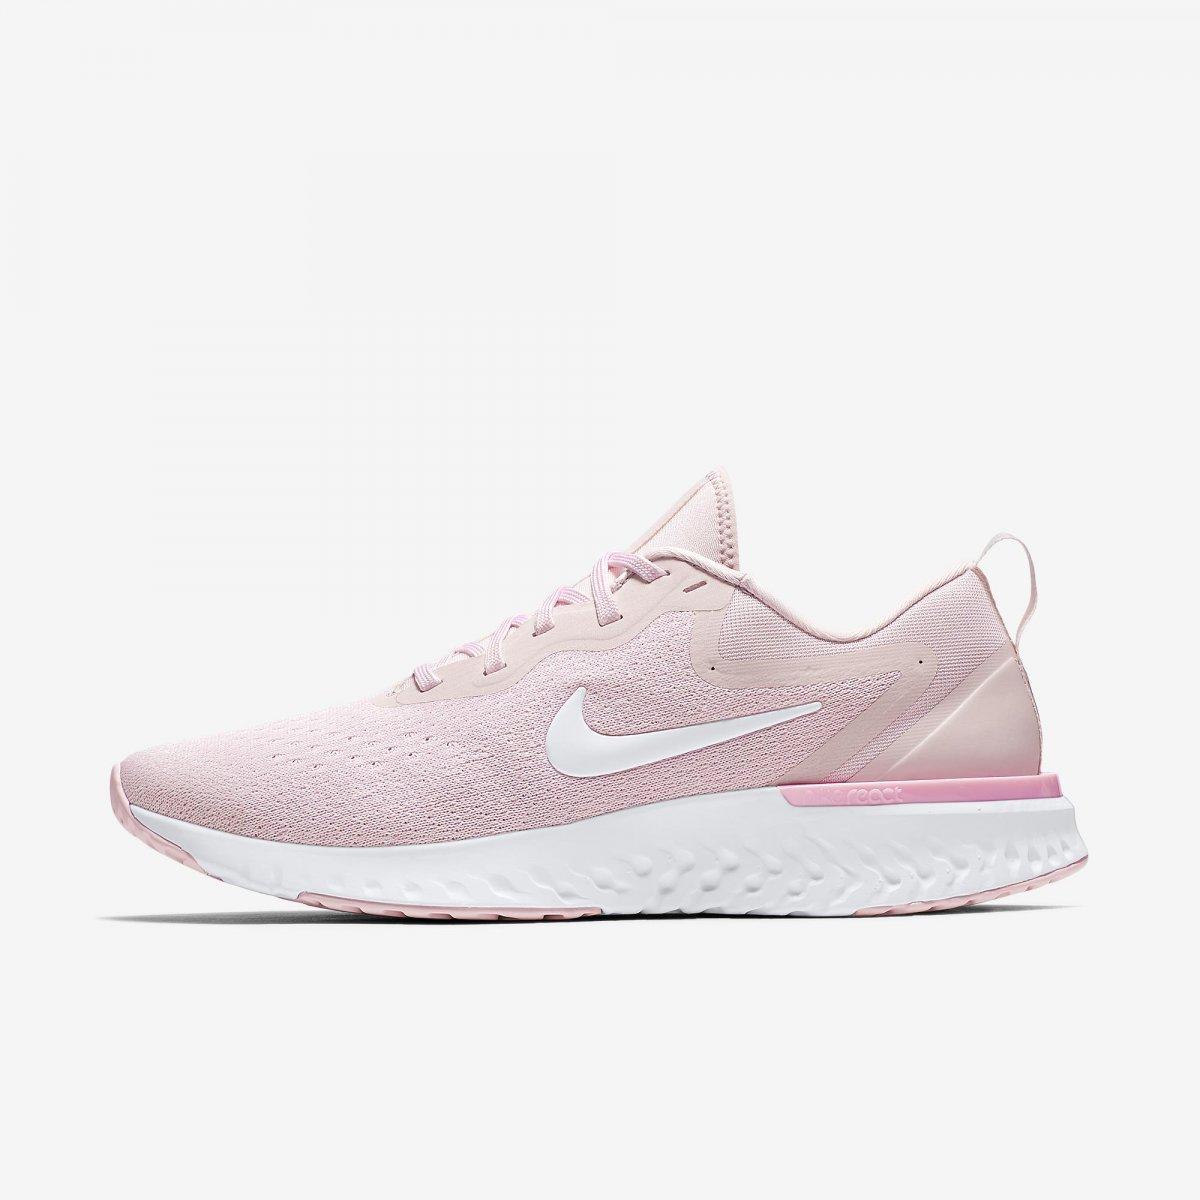 acc8b6dd1e Tênis Nike Odyssey React Feminino 8872309988GLIDE Nike - RSA ...